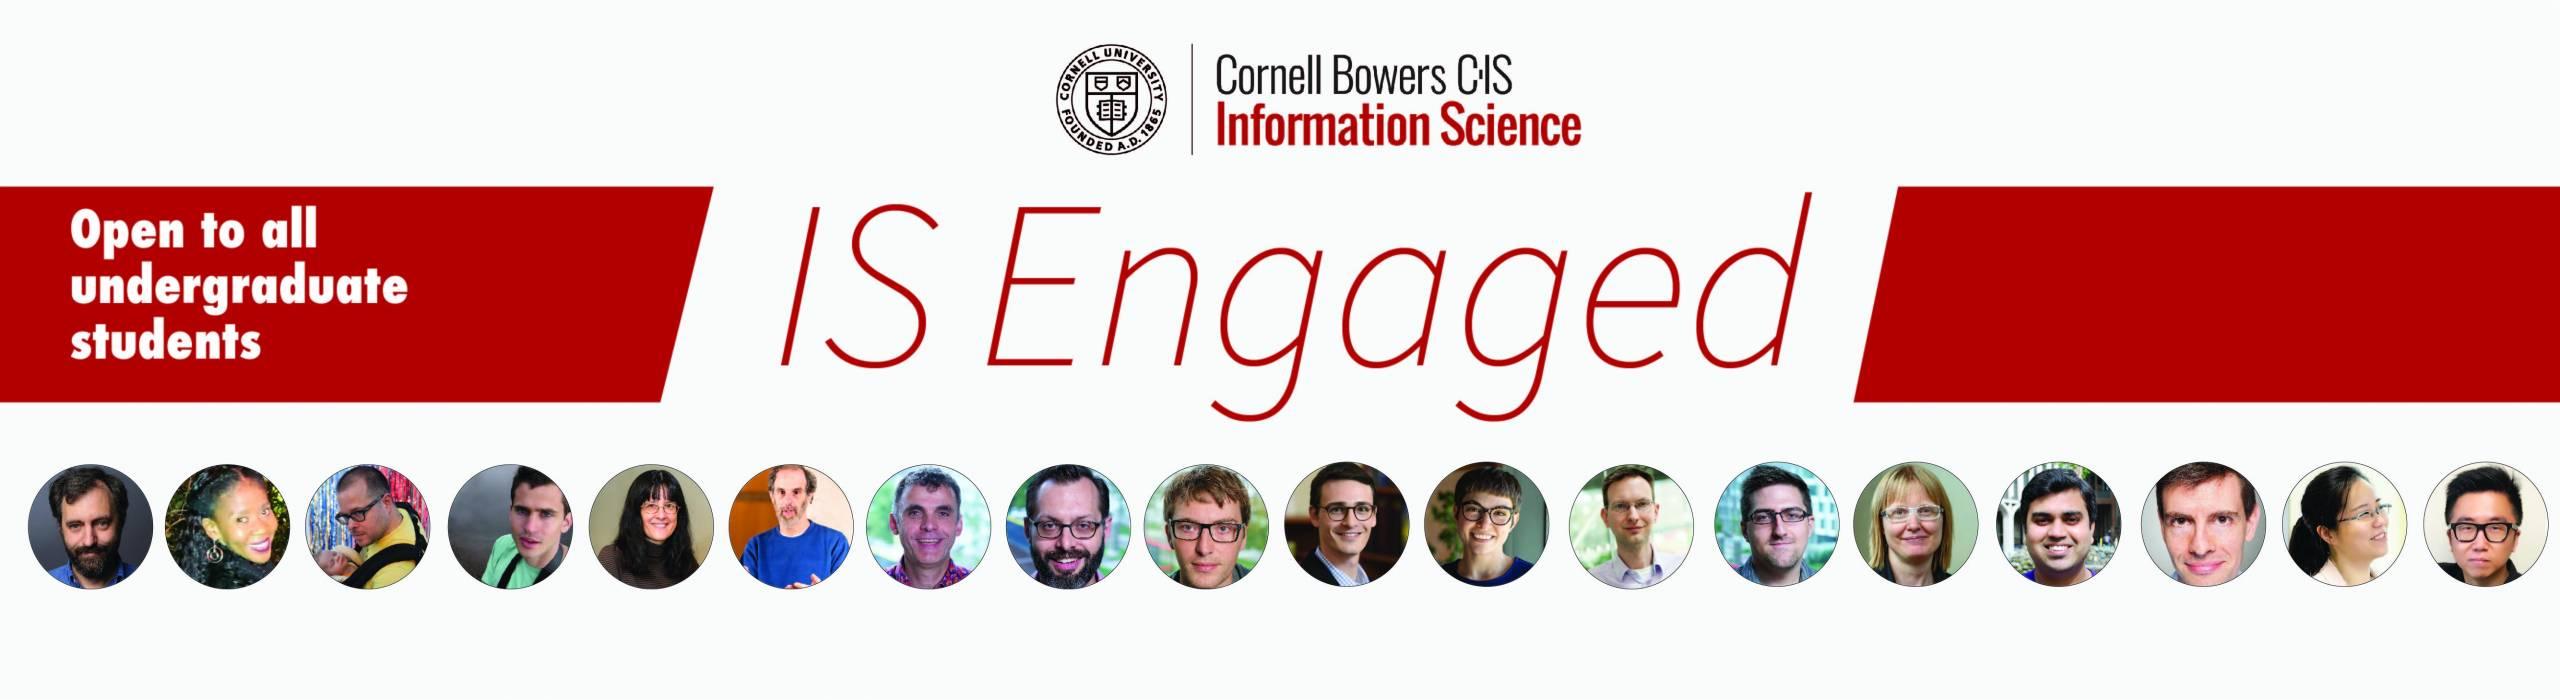 IS Engaged - Ugrad Advising Forum open to all Cornell undergraduates